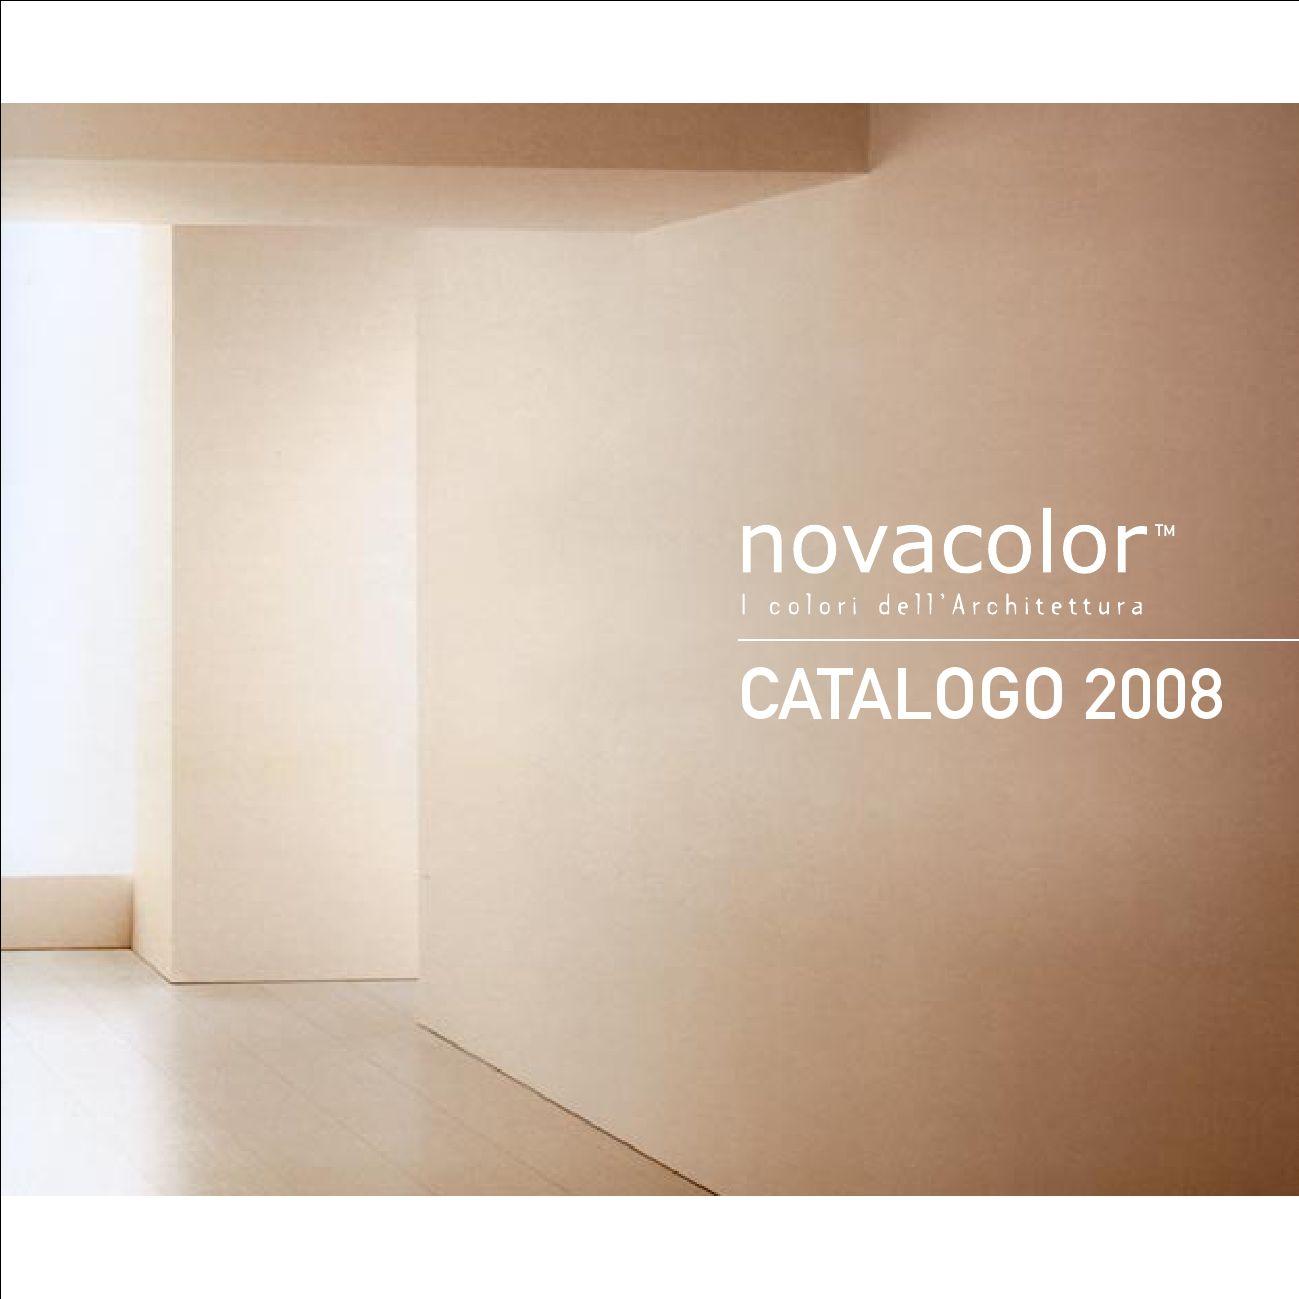 Novacolor Catalogo 2012 2013 by Novacolor - issuu